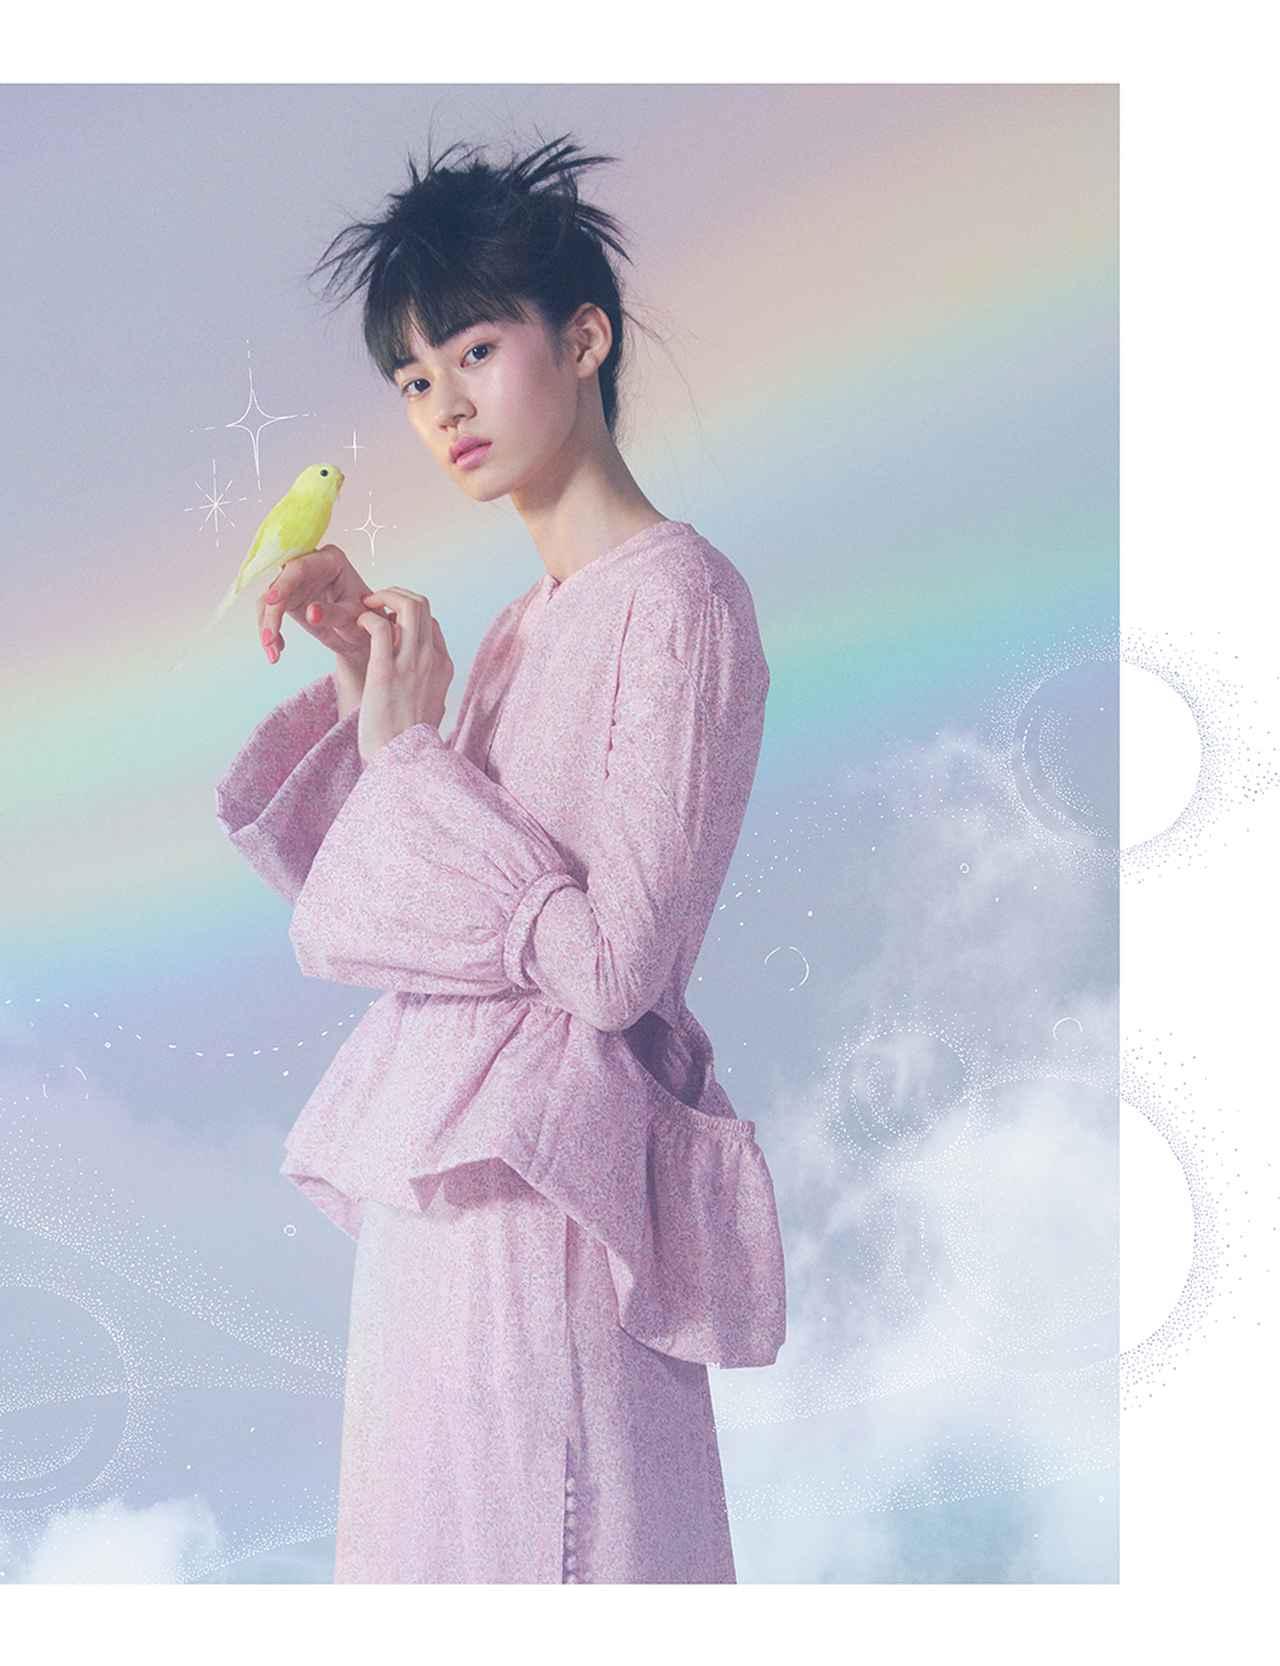 Images : 7番目の画像 - 「ファッションは愉快だ!」のアルバム - T JAPAN:The New York Times Style Magazine 公式サイト